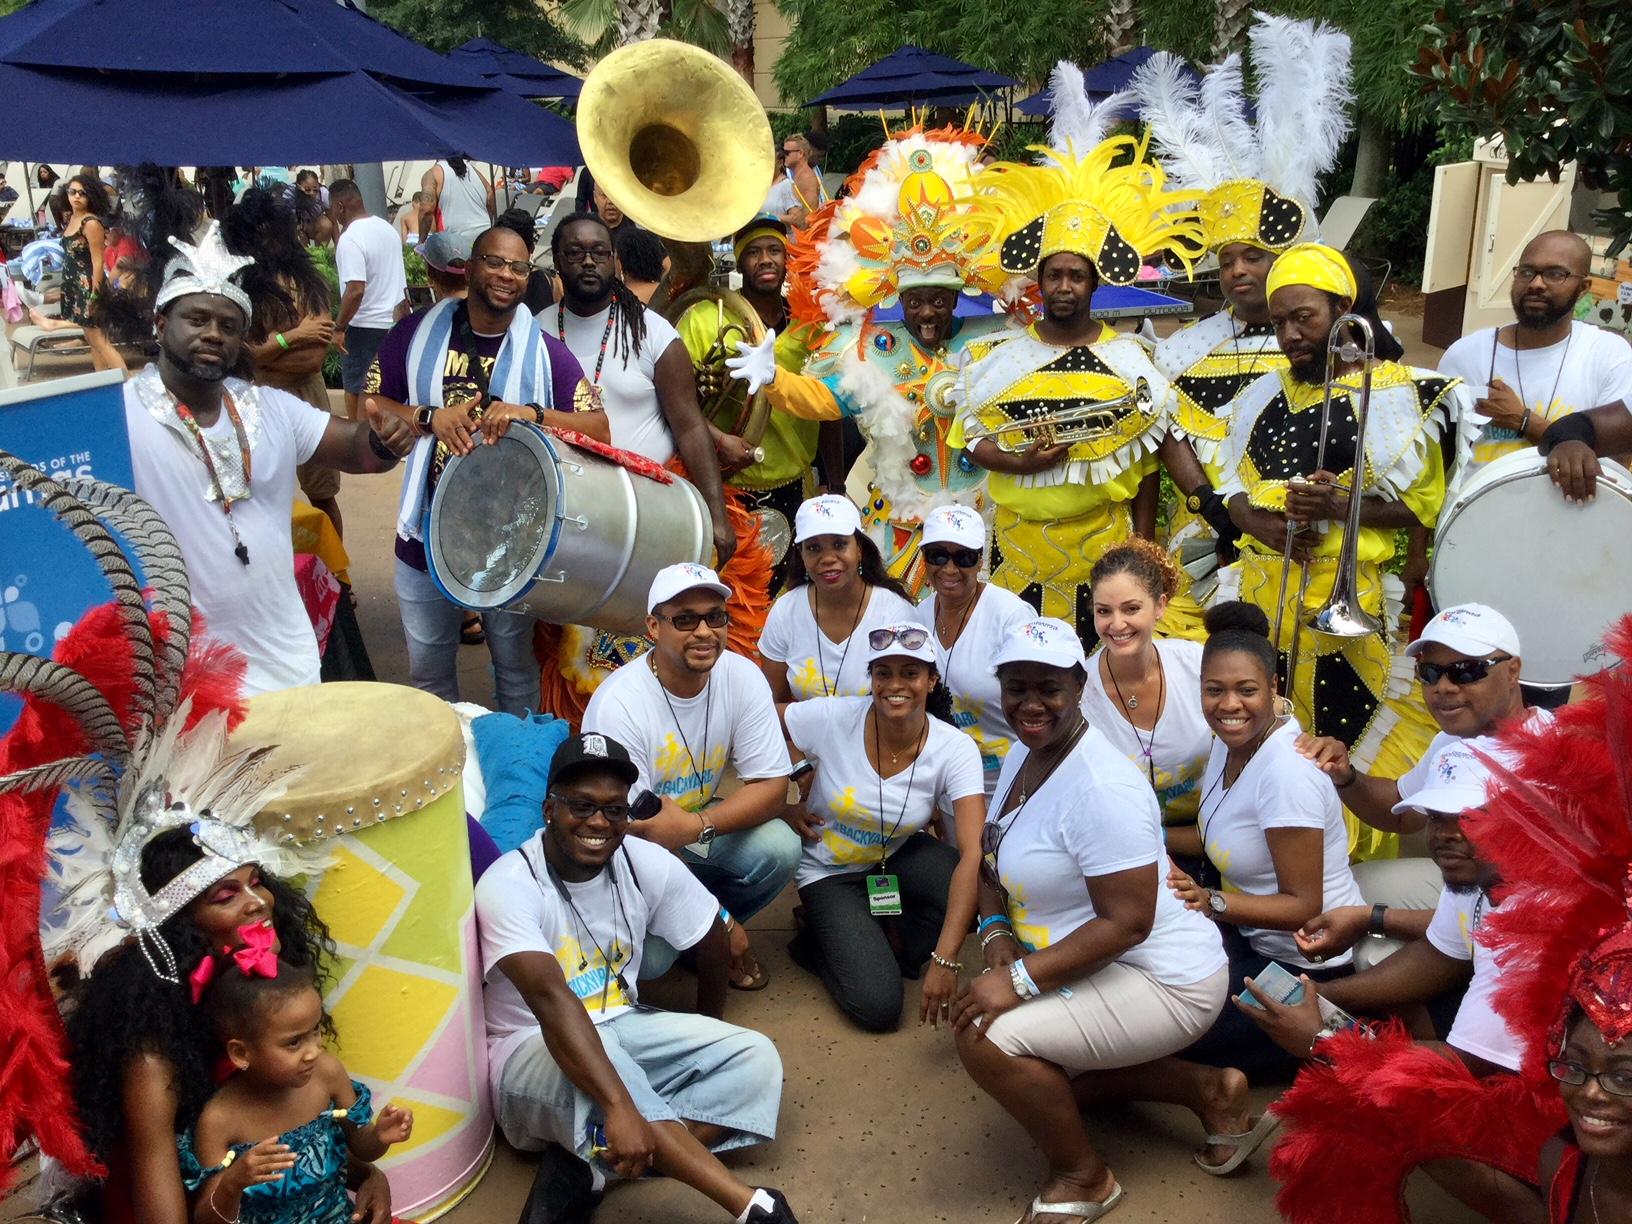 Bahamas garners massive exposure at Tom Joyner event in Orlando, Florida